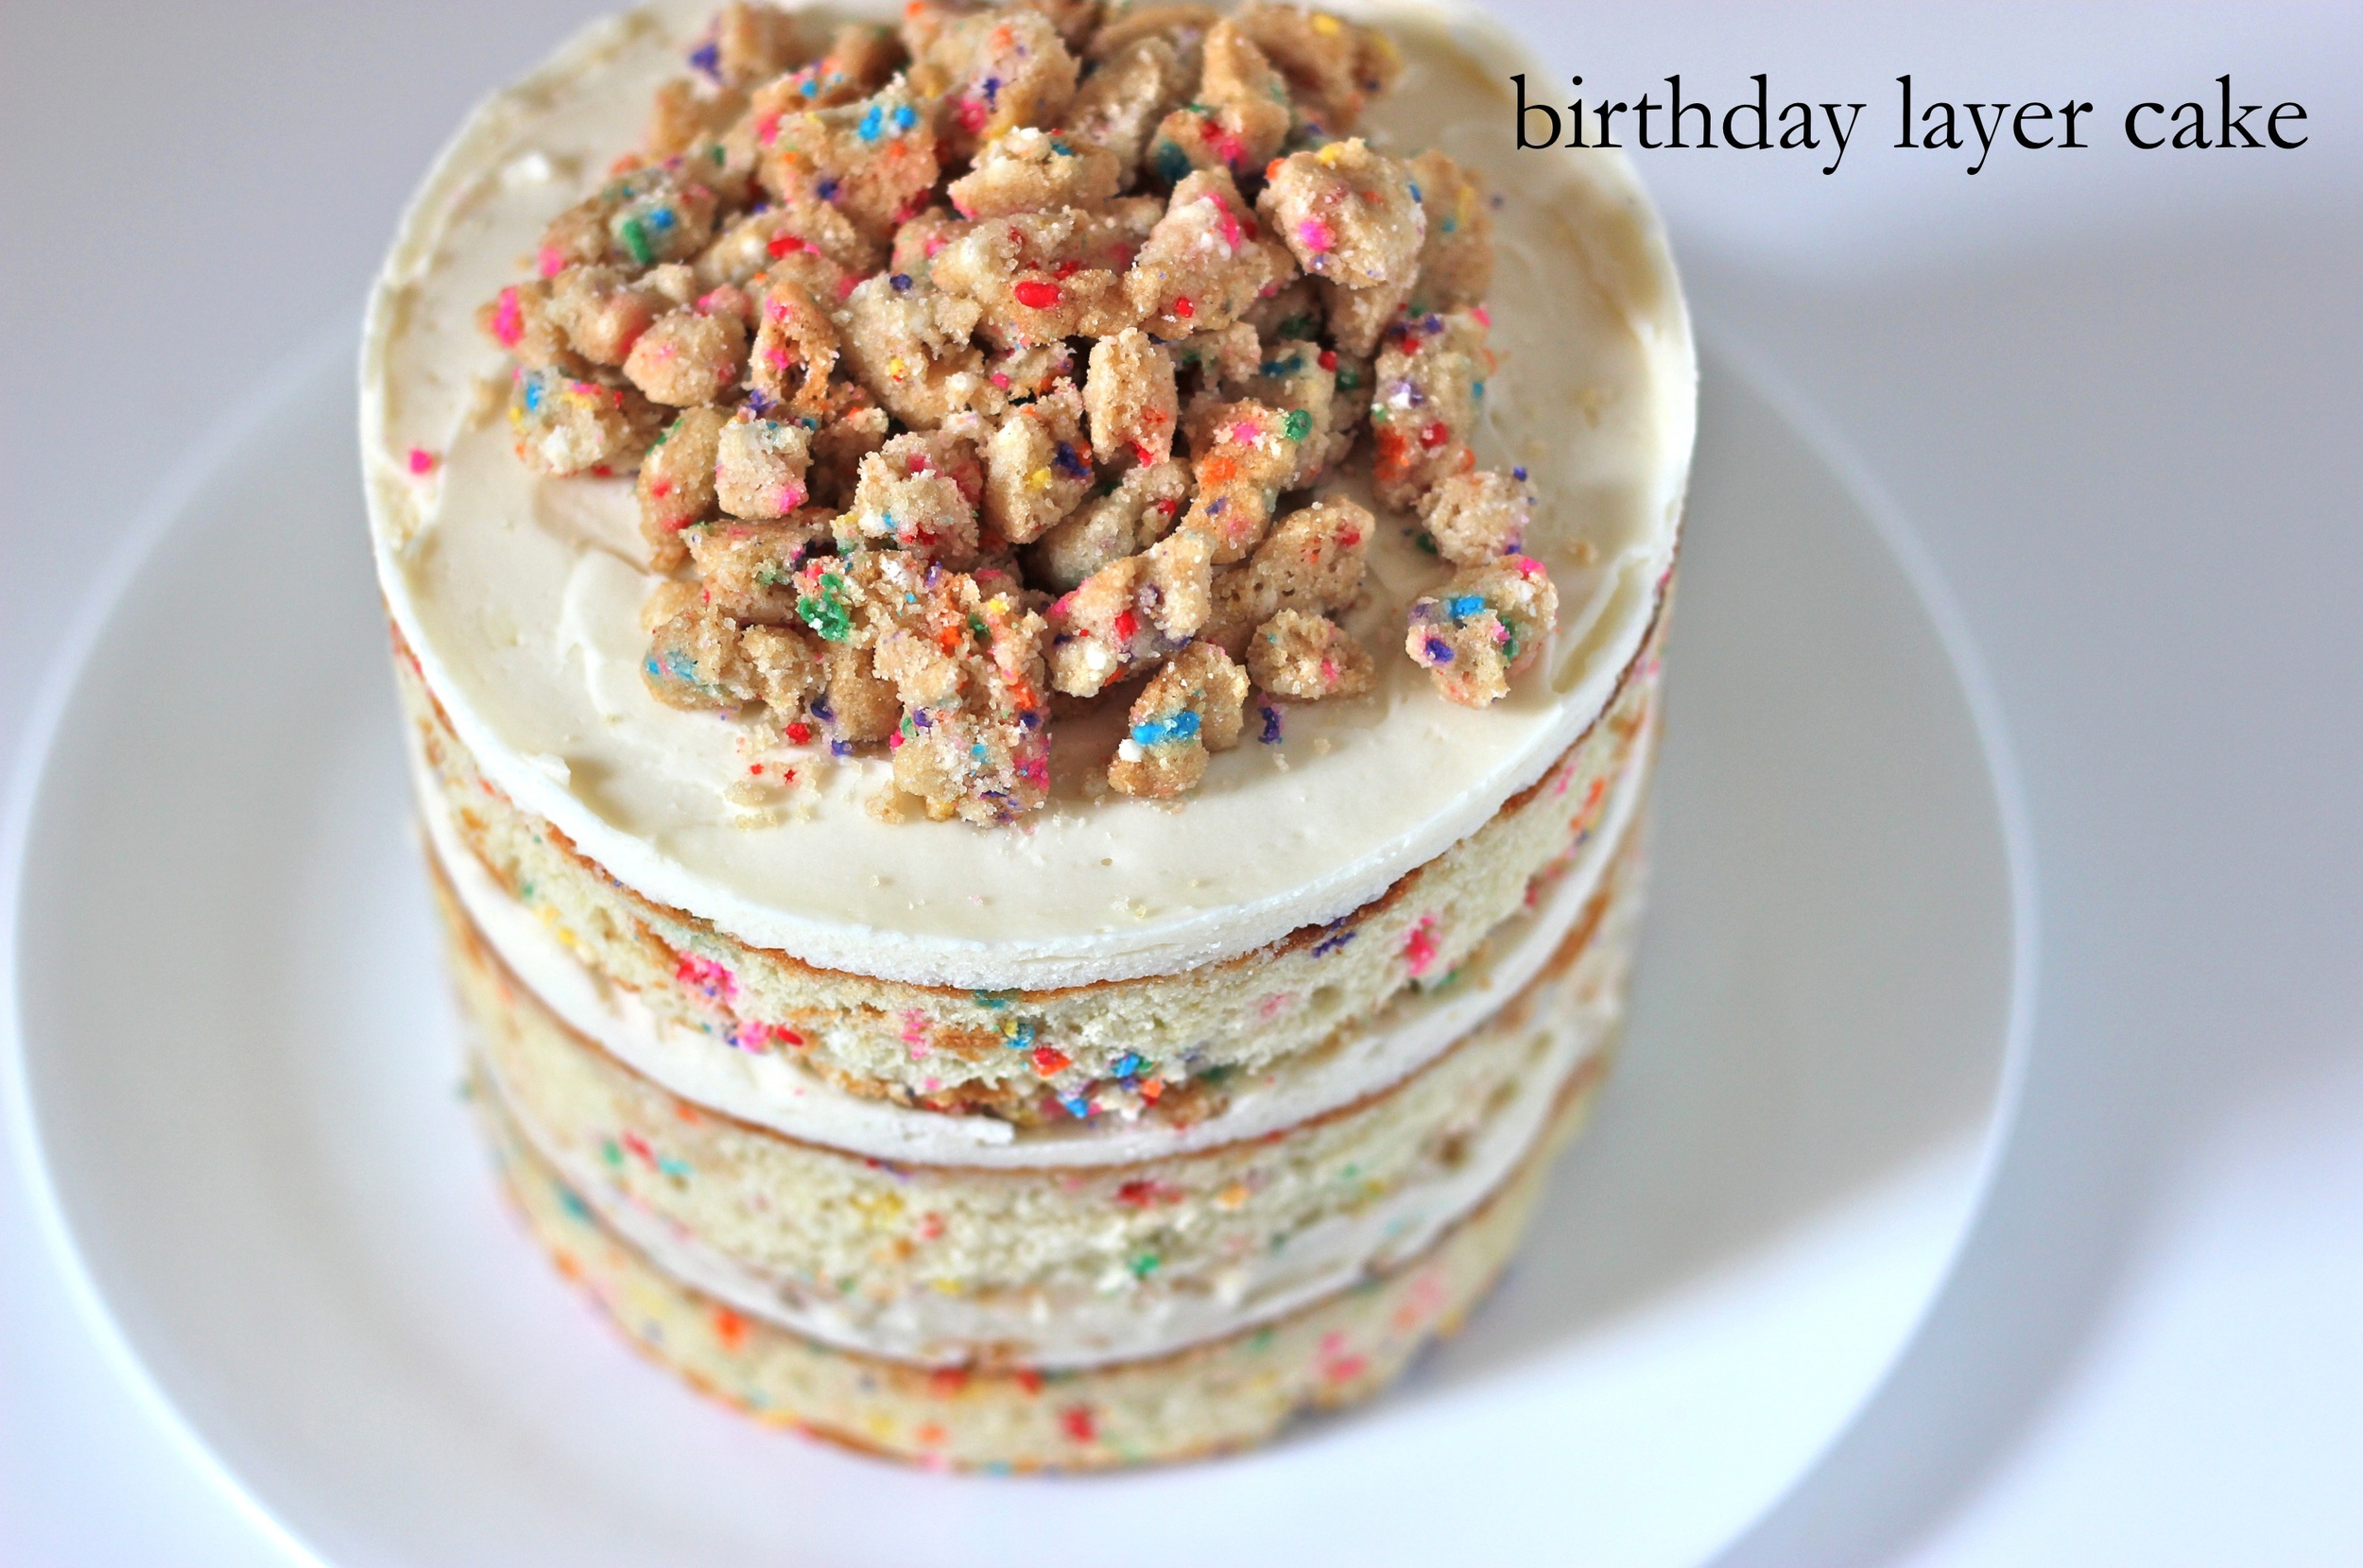 birthdaylayercaketitle